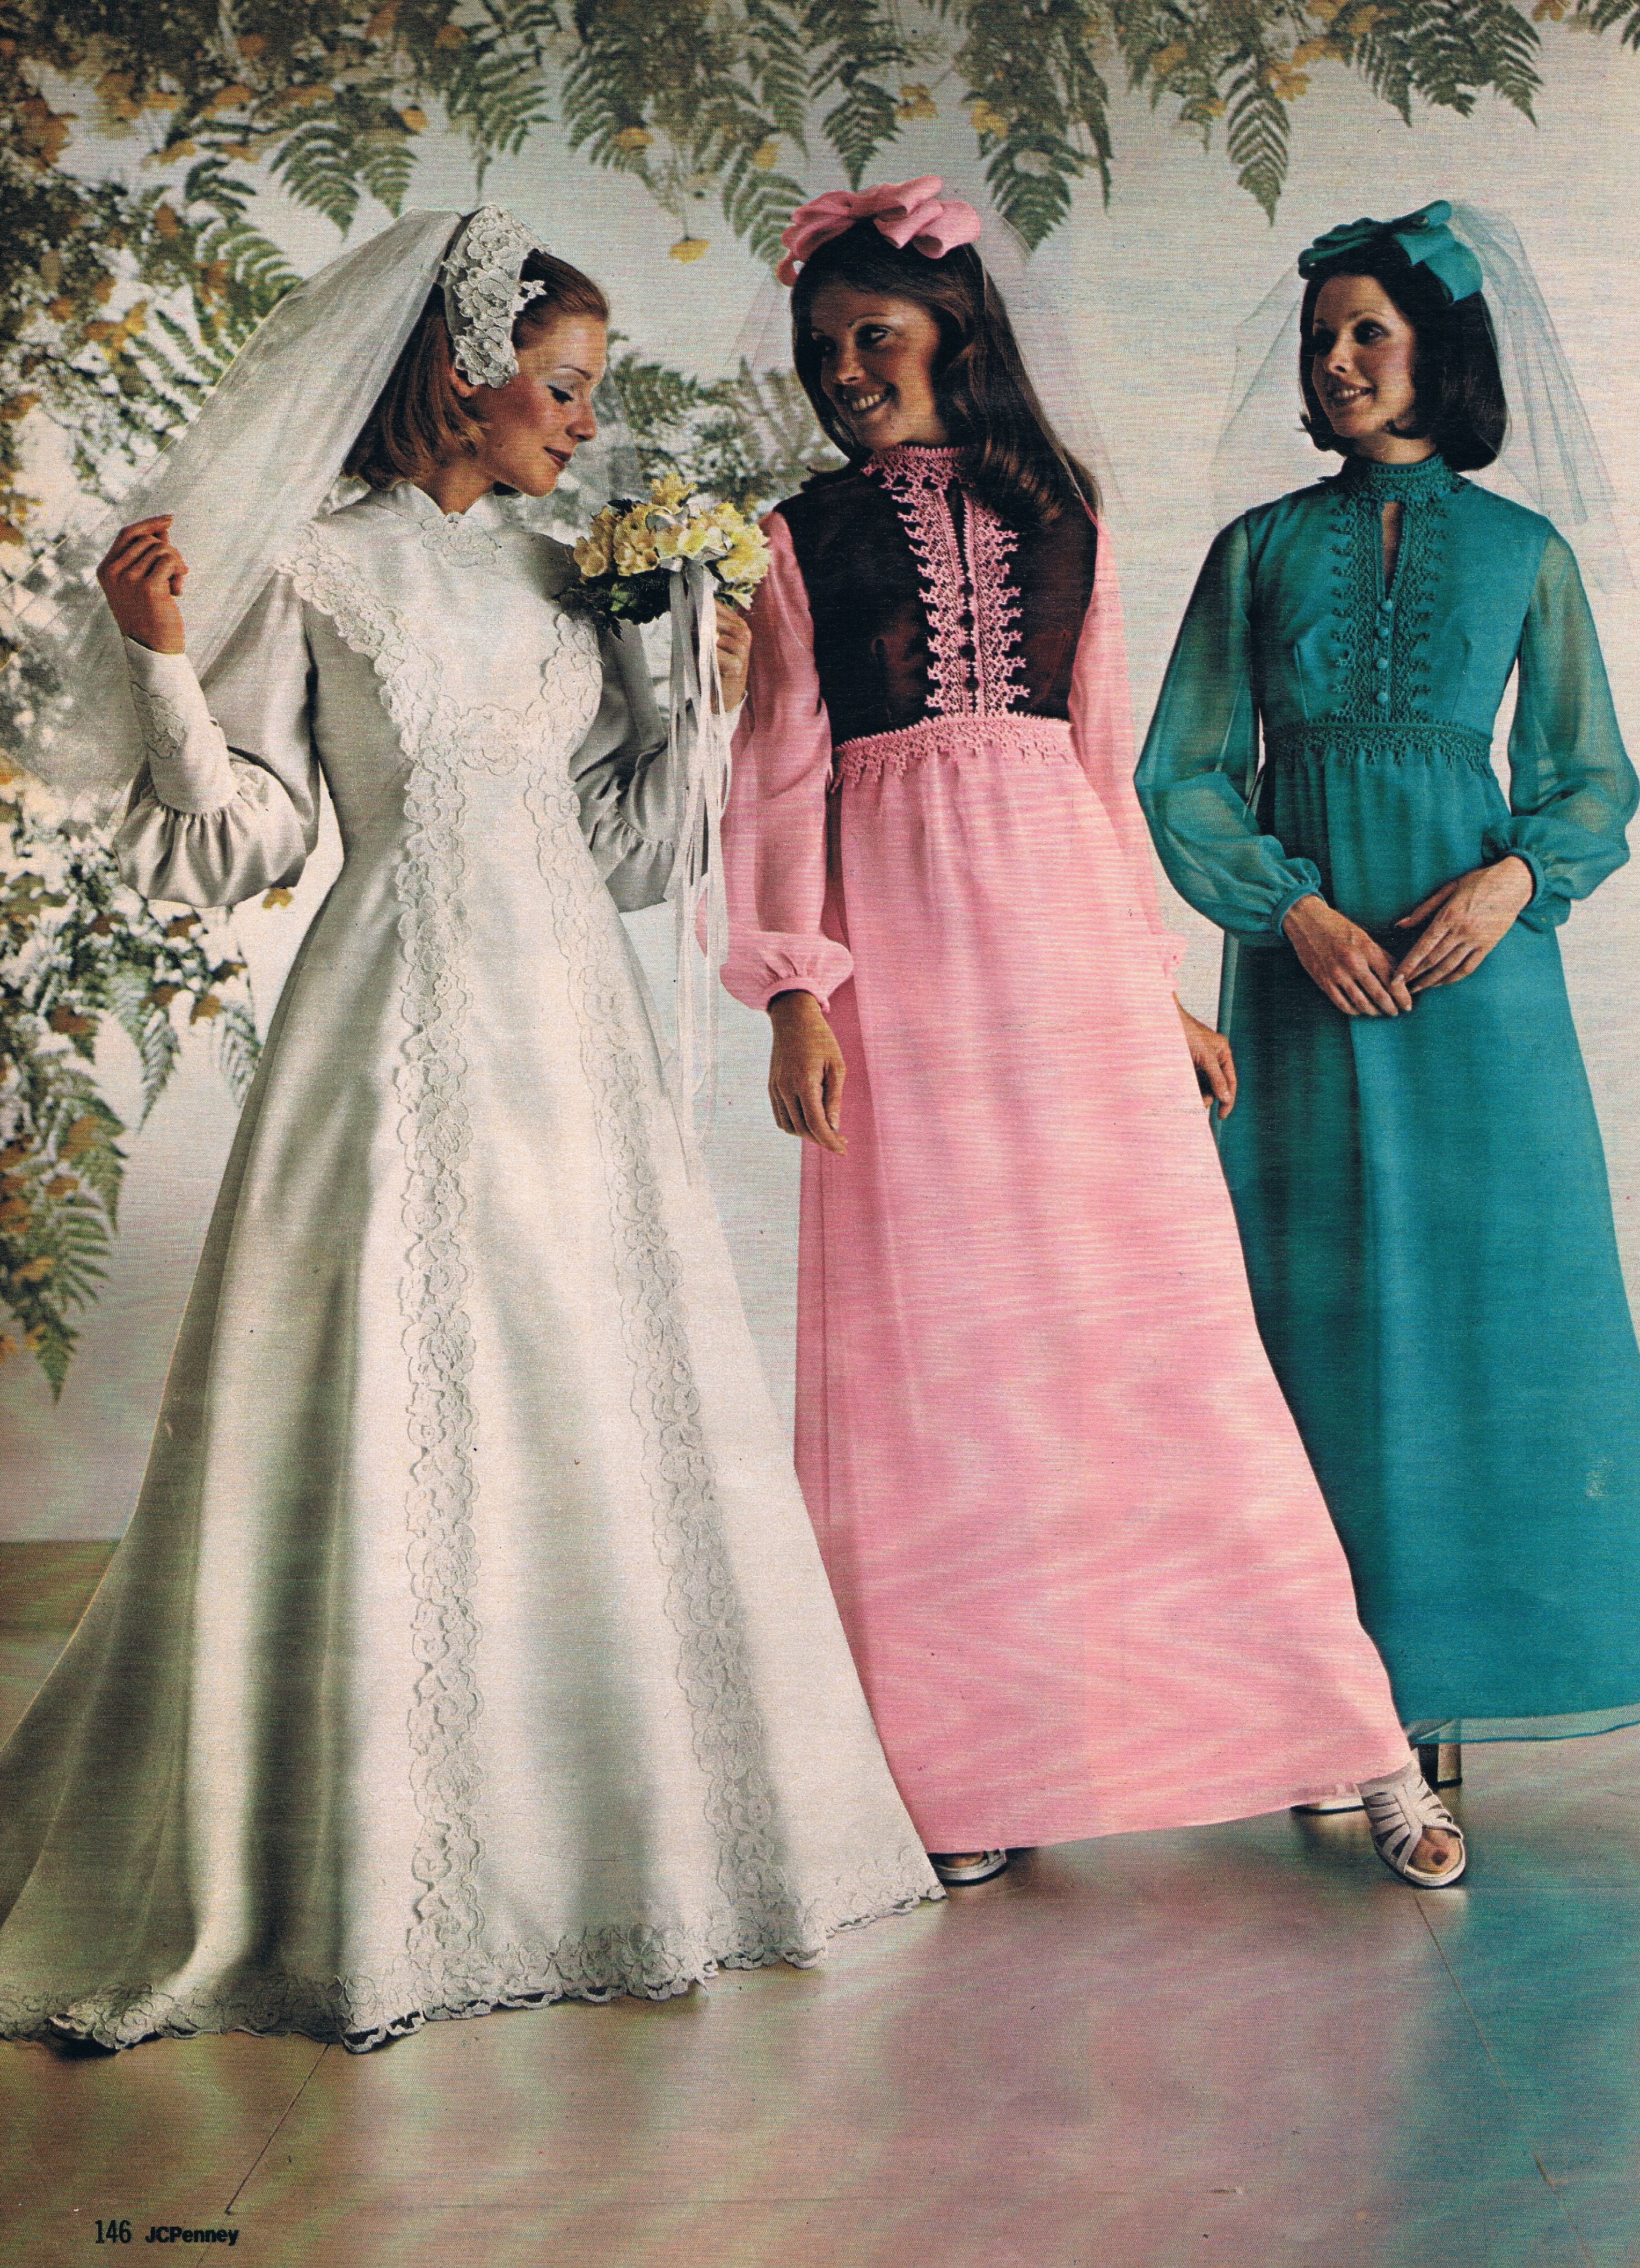 Penneys catalog 70s   Vintage/retro wedding   Pinterest ...